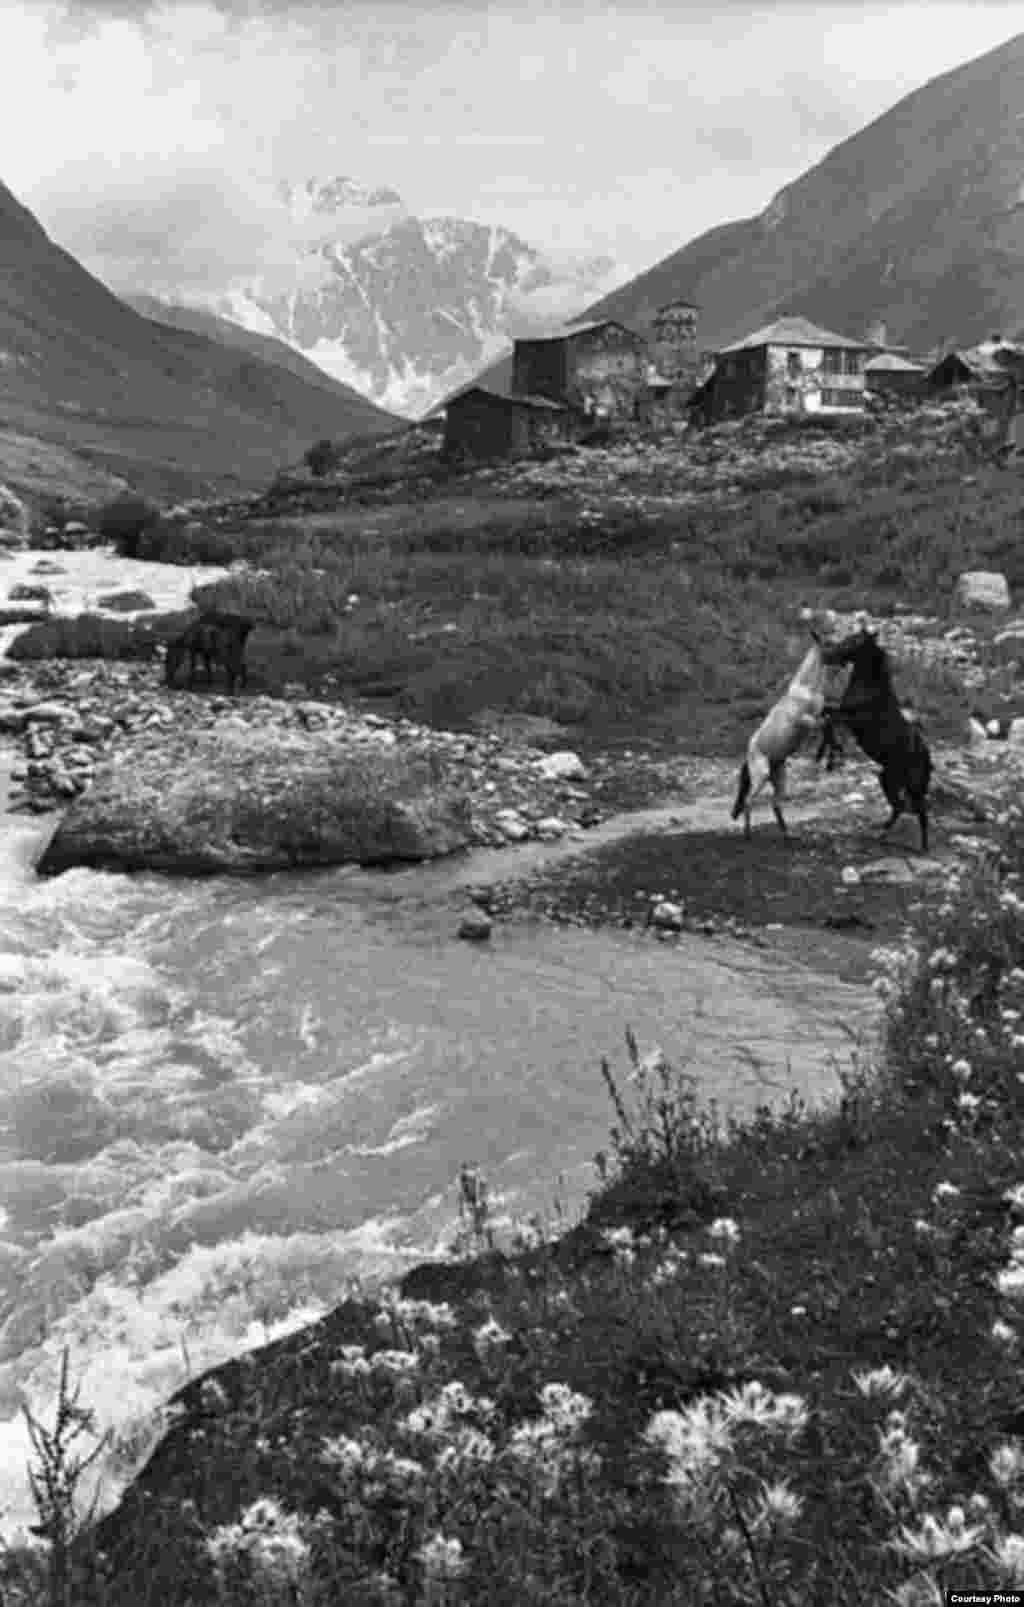 Гия Чхатарашвили, «Лошади» 1995, из серии «Ушгули», 1991-2000